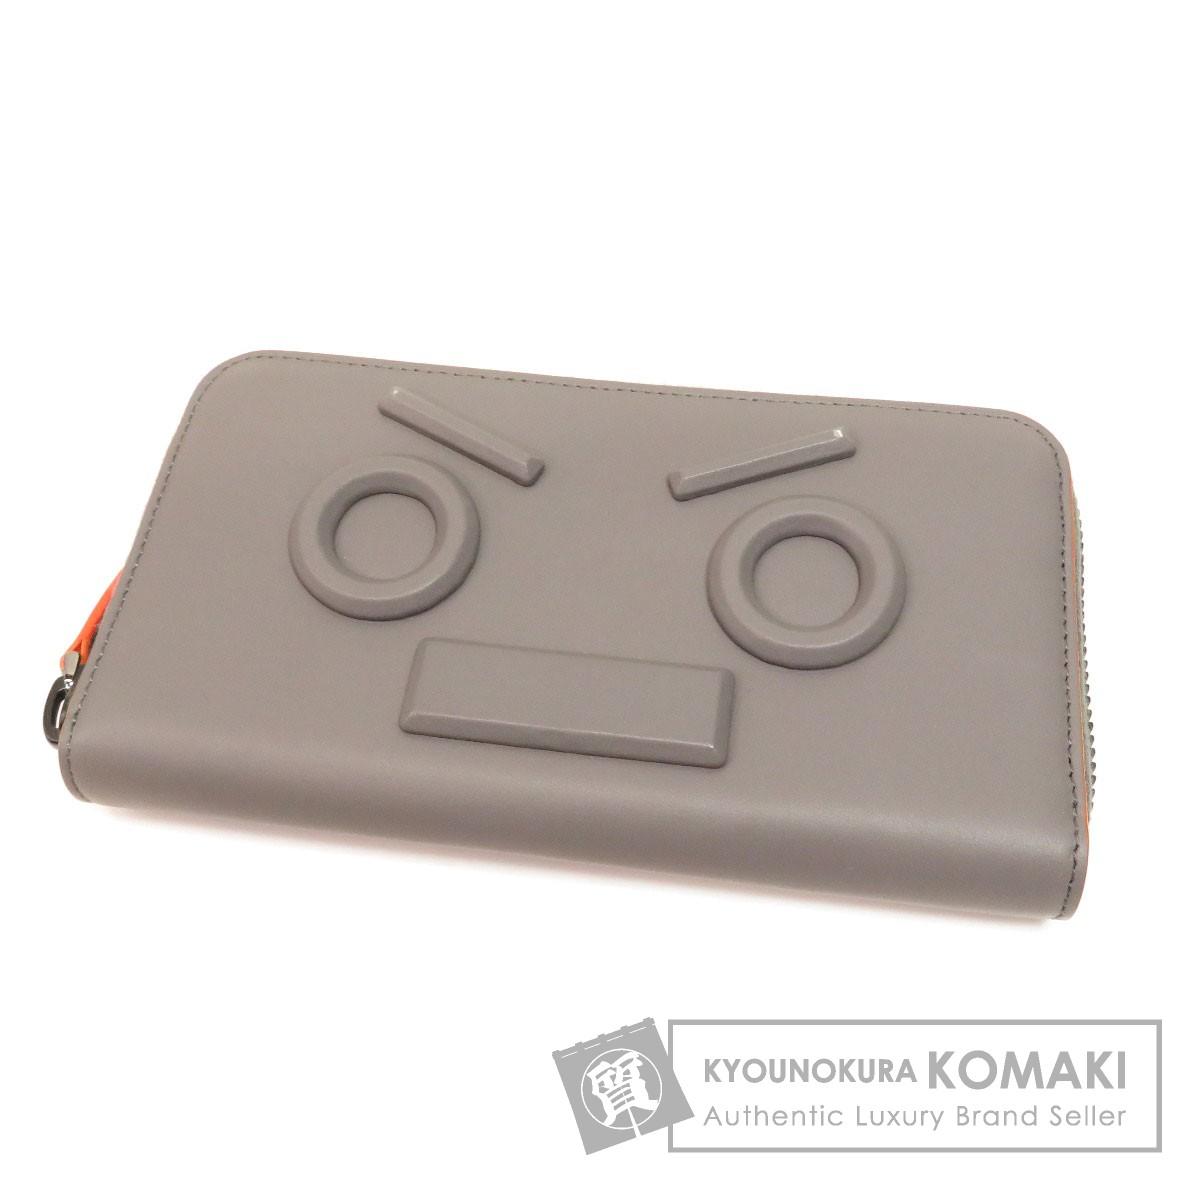 FENDI ロボット 長財布(小銭入れあり) レザー レディース 【中古】【フェンディ】